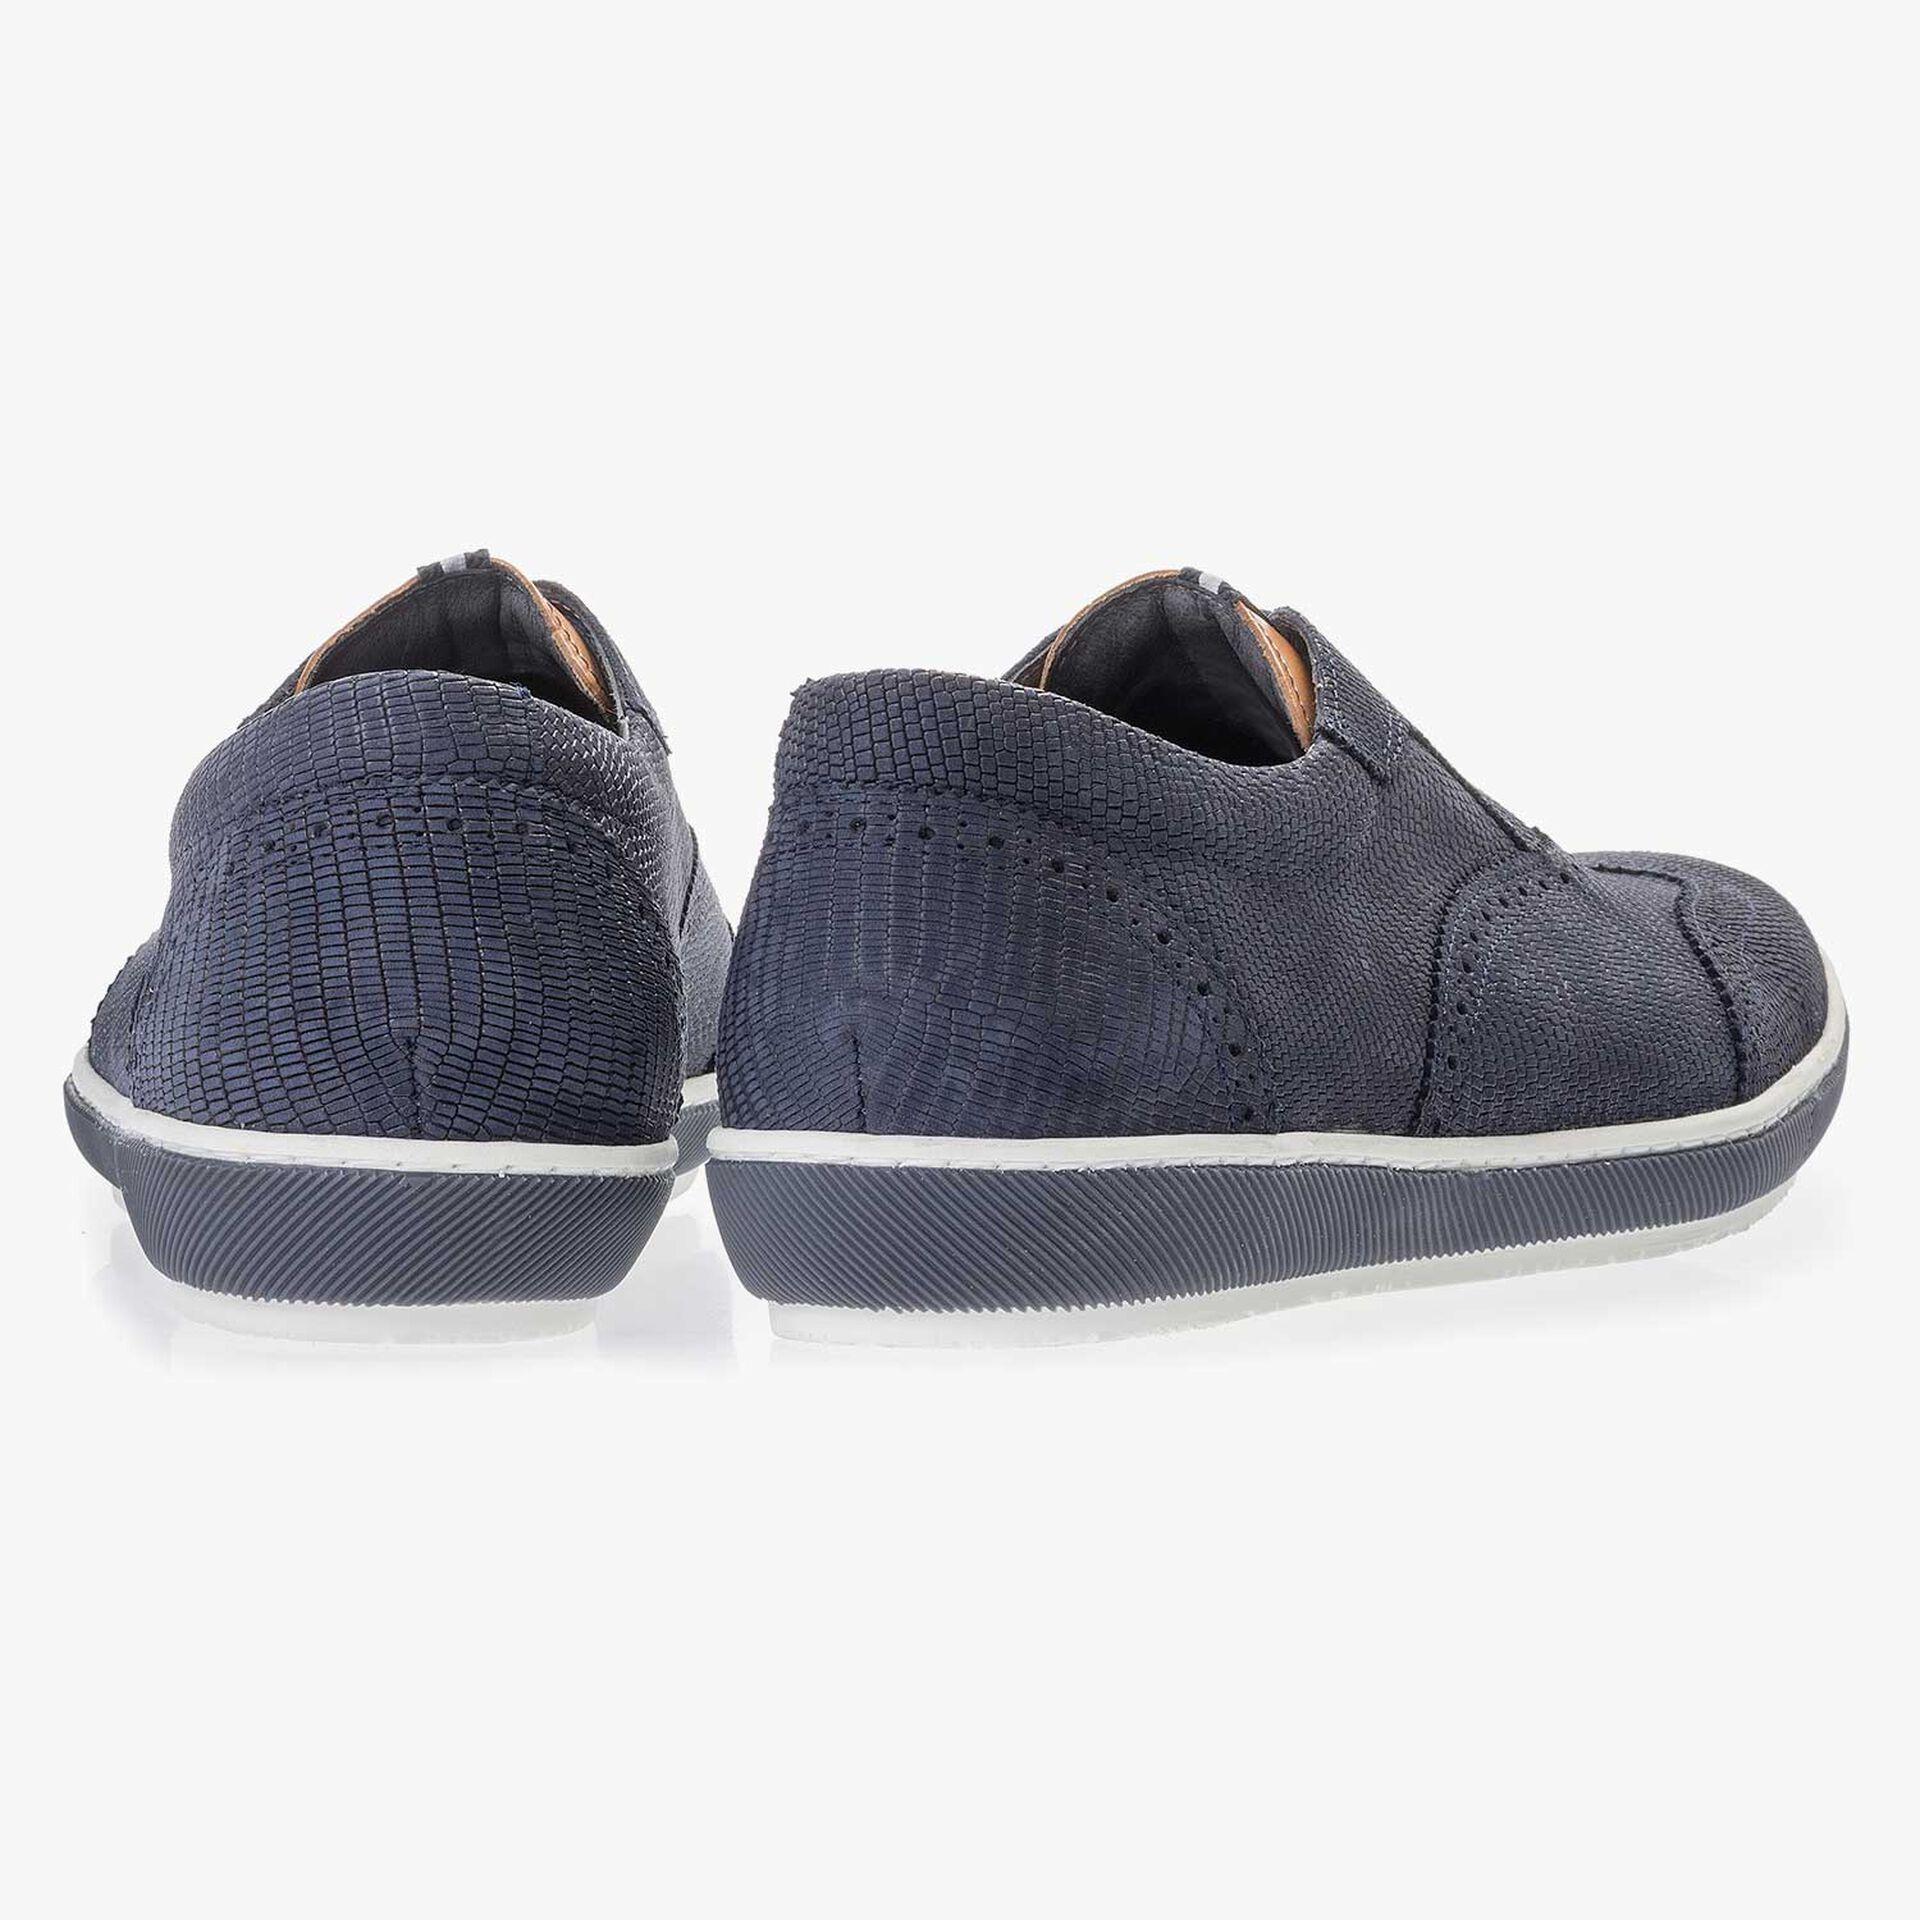 Blauer Brogue Nubukleder Sneaker